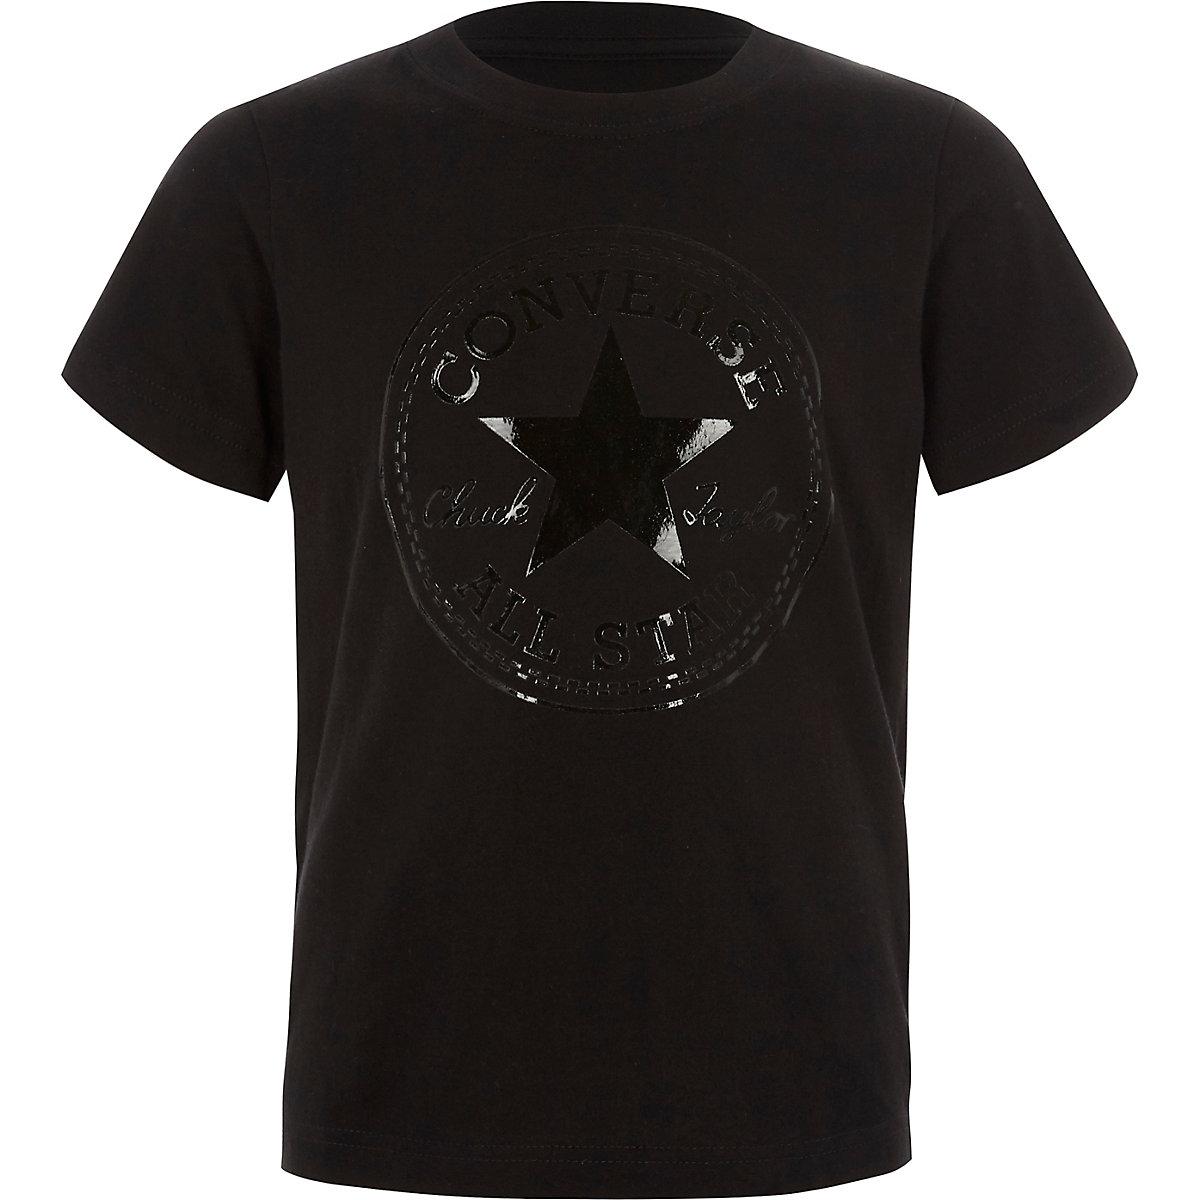 9d355fcbac91 Boys Converse black foil logo T-shirt - T-shirts - T-Shirts   Vests - boys